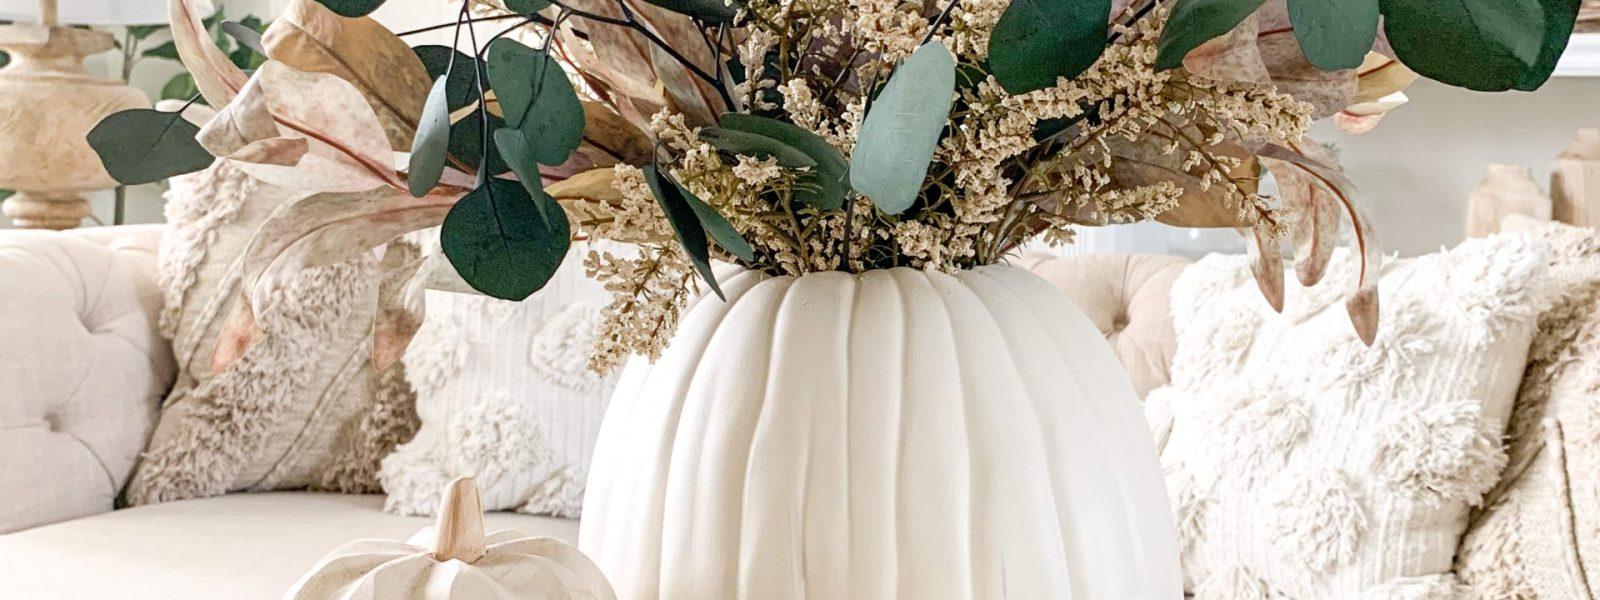 Fall DIY Pumpkin Vase